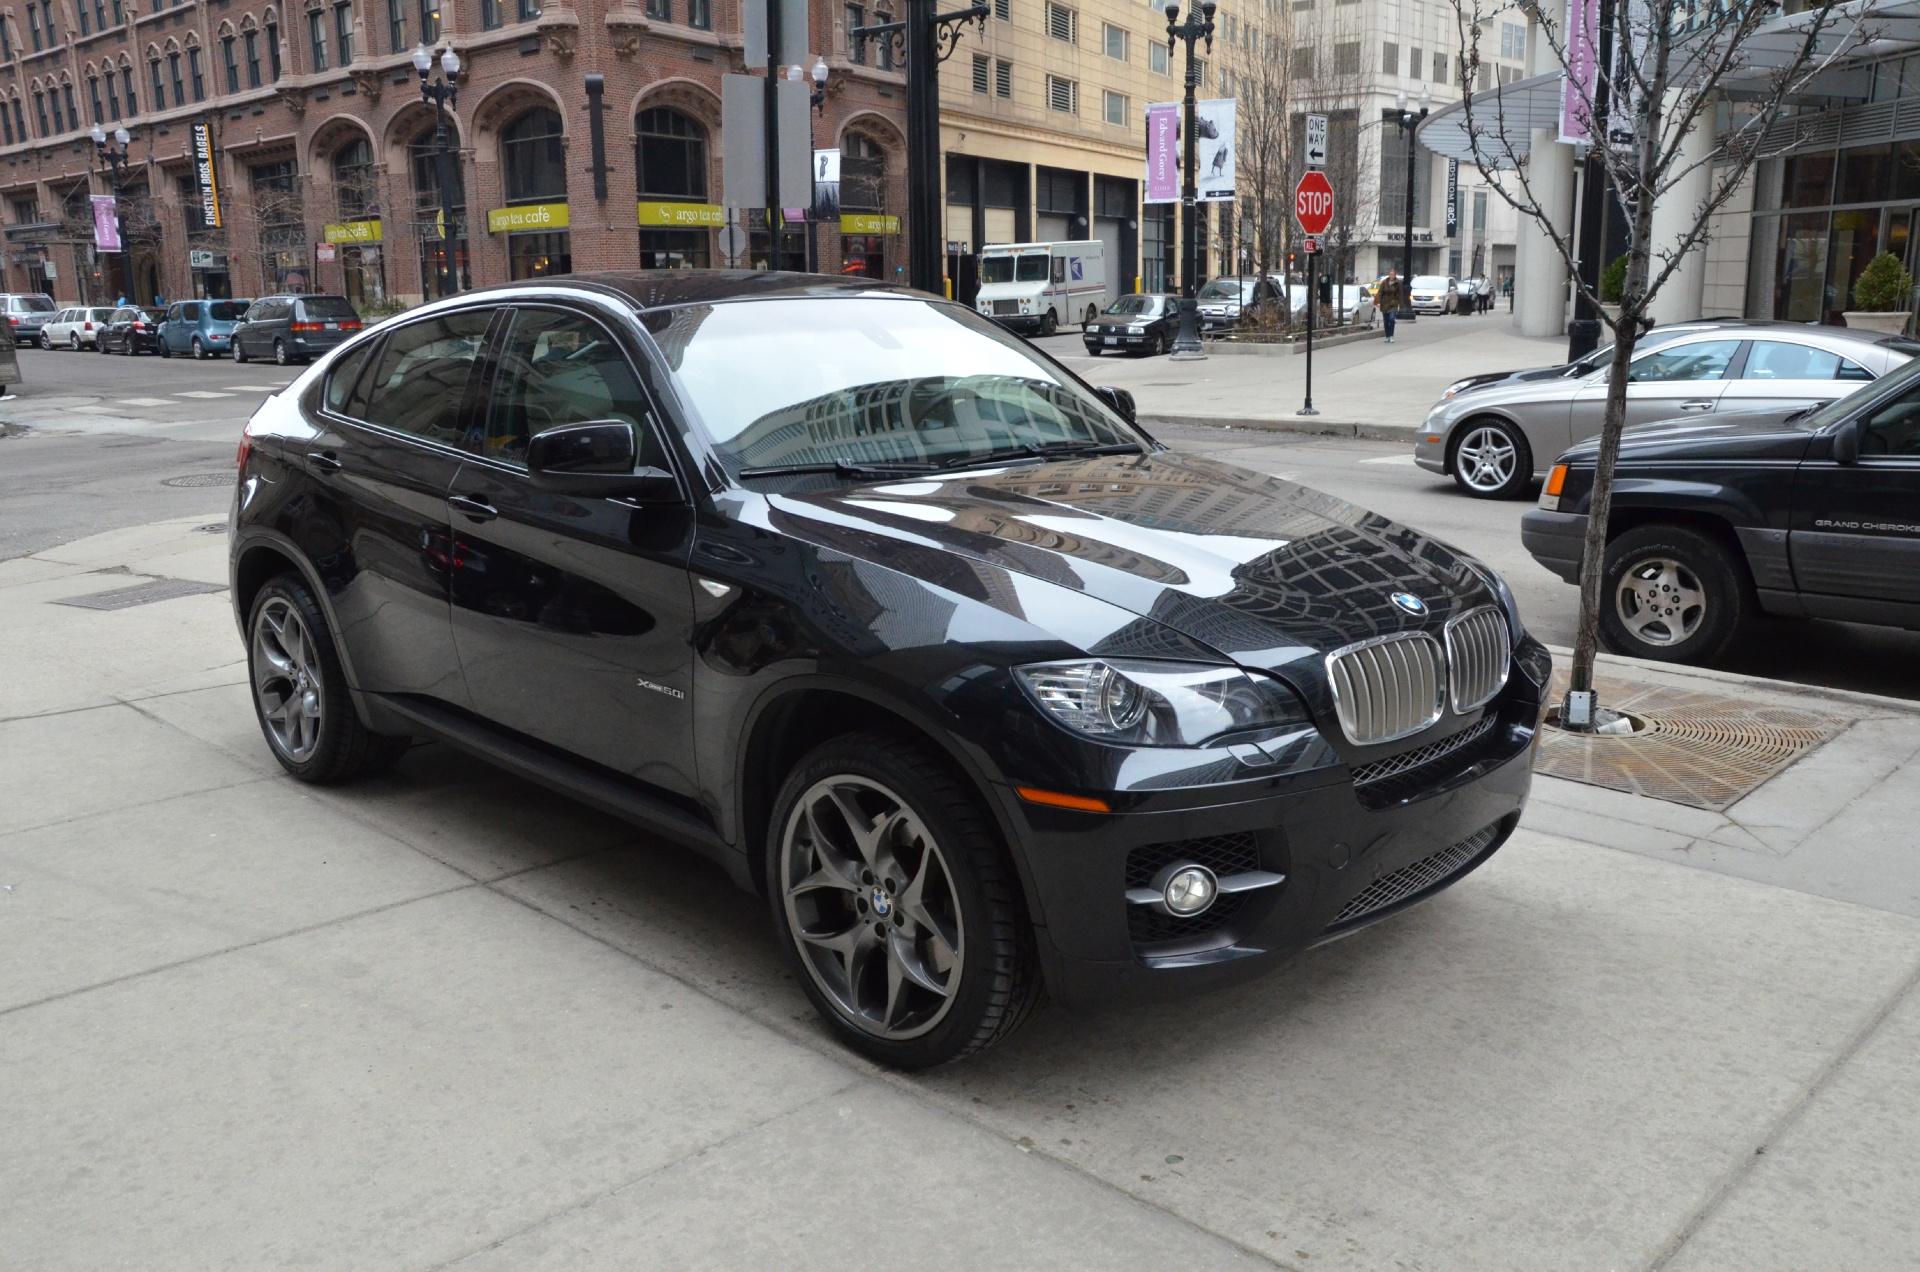 2010 Bmw X6 Xdrive50i Stock 94807 For Sale Near Chicago